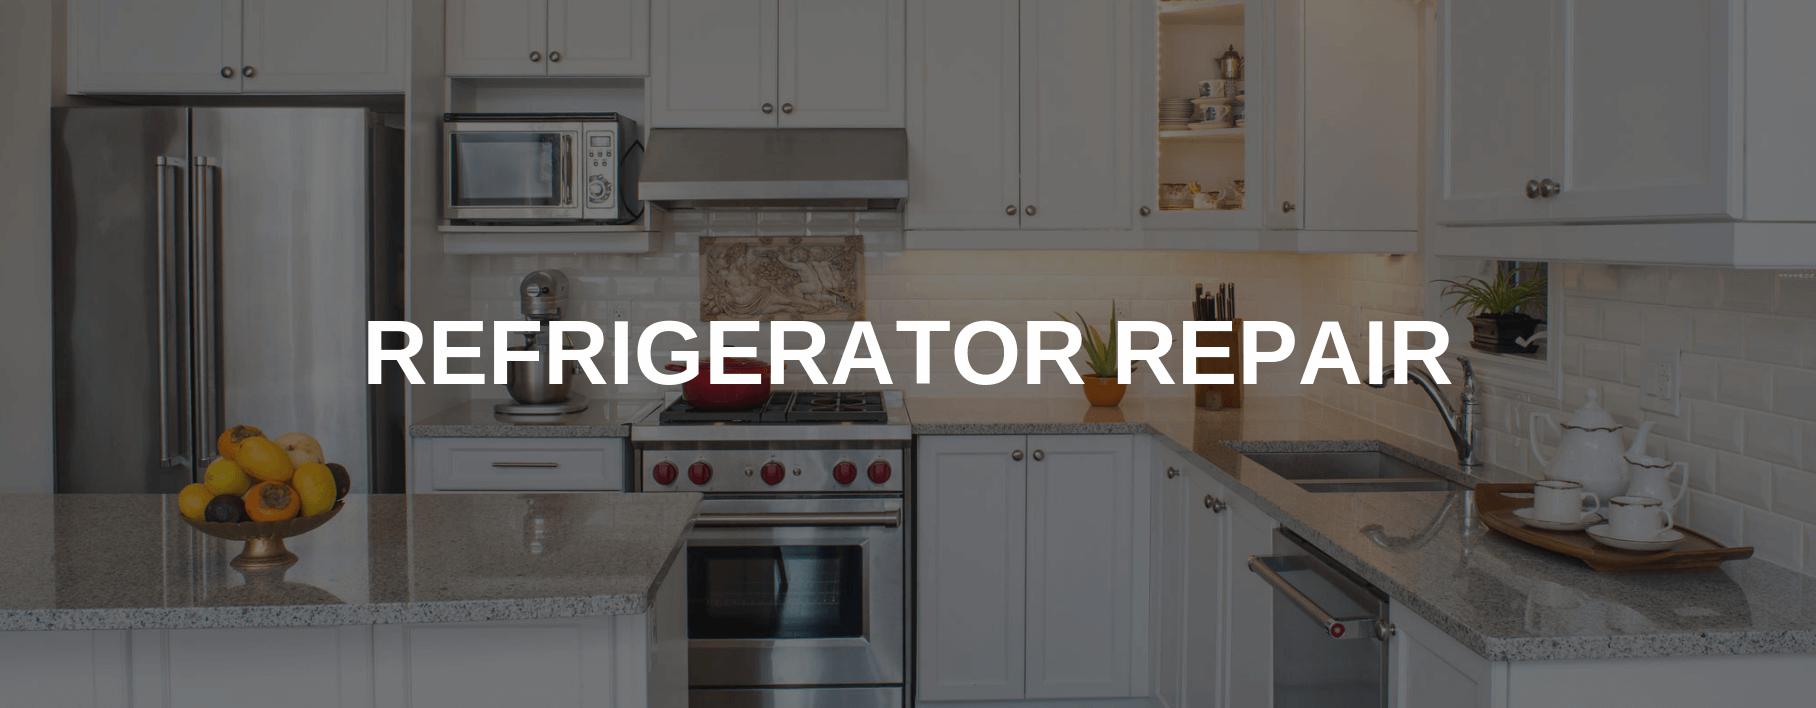 refrigerator repair milothian